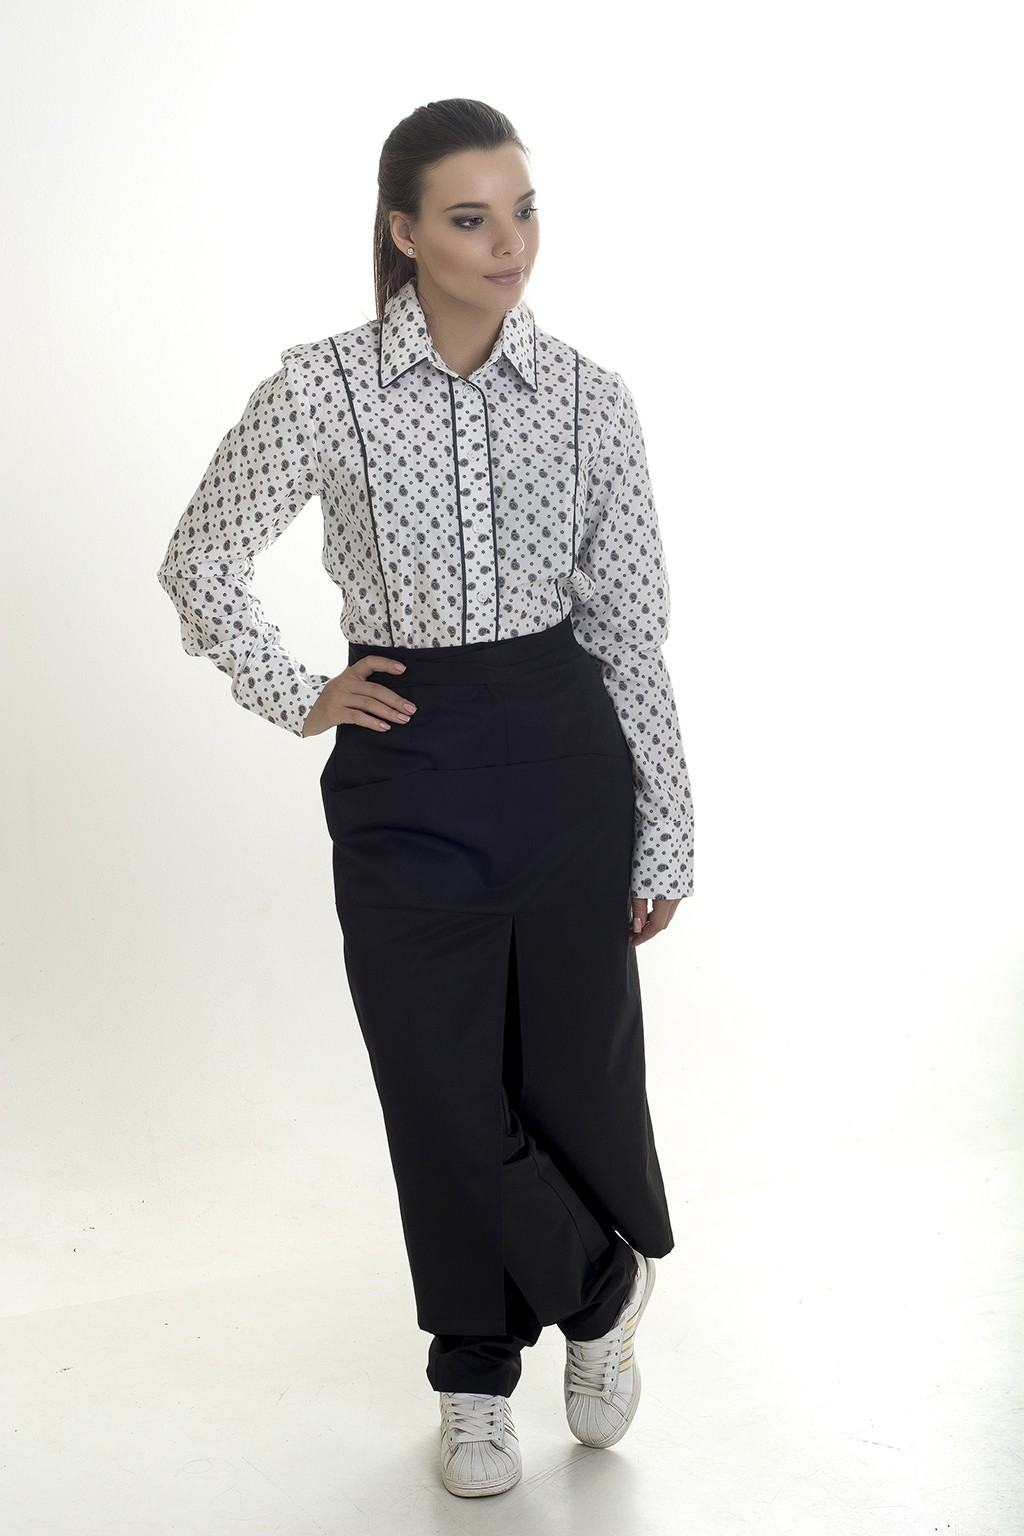 18108 Рубашка, фартук  для официанта